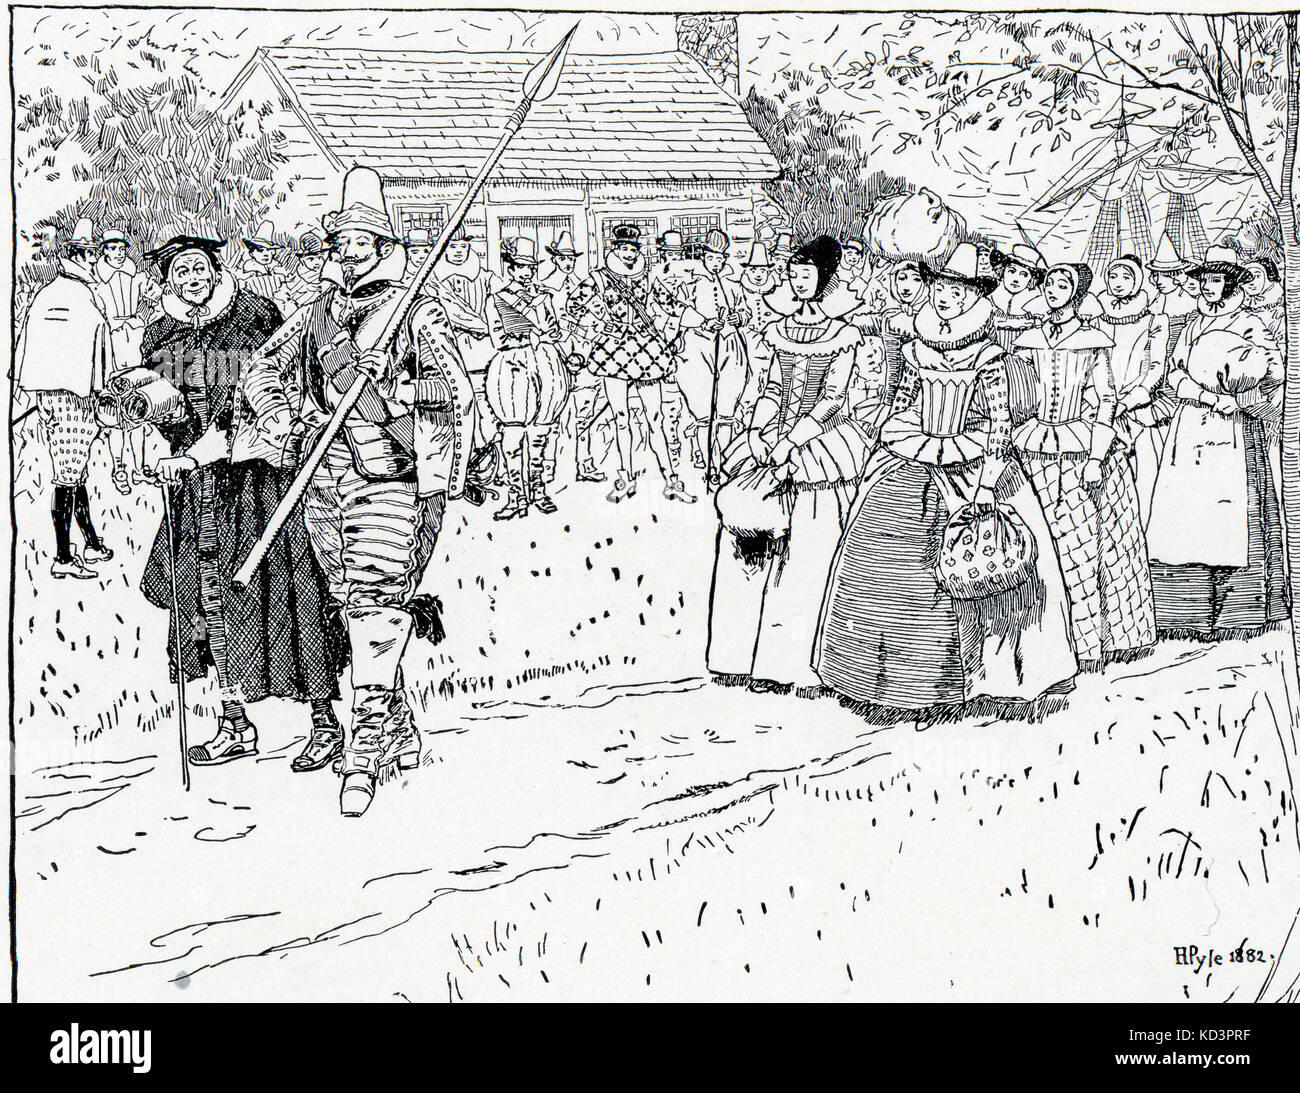 33 arrival of the english in virginia virtual jamestown - HD1024×852